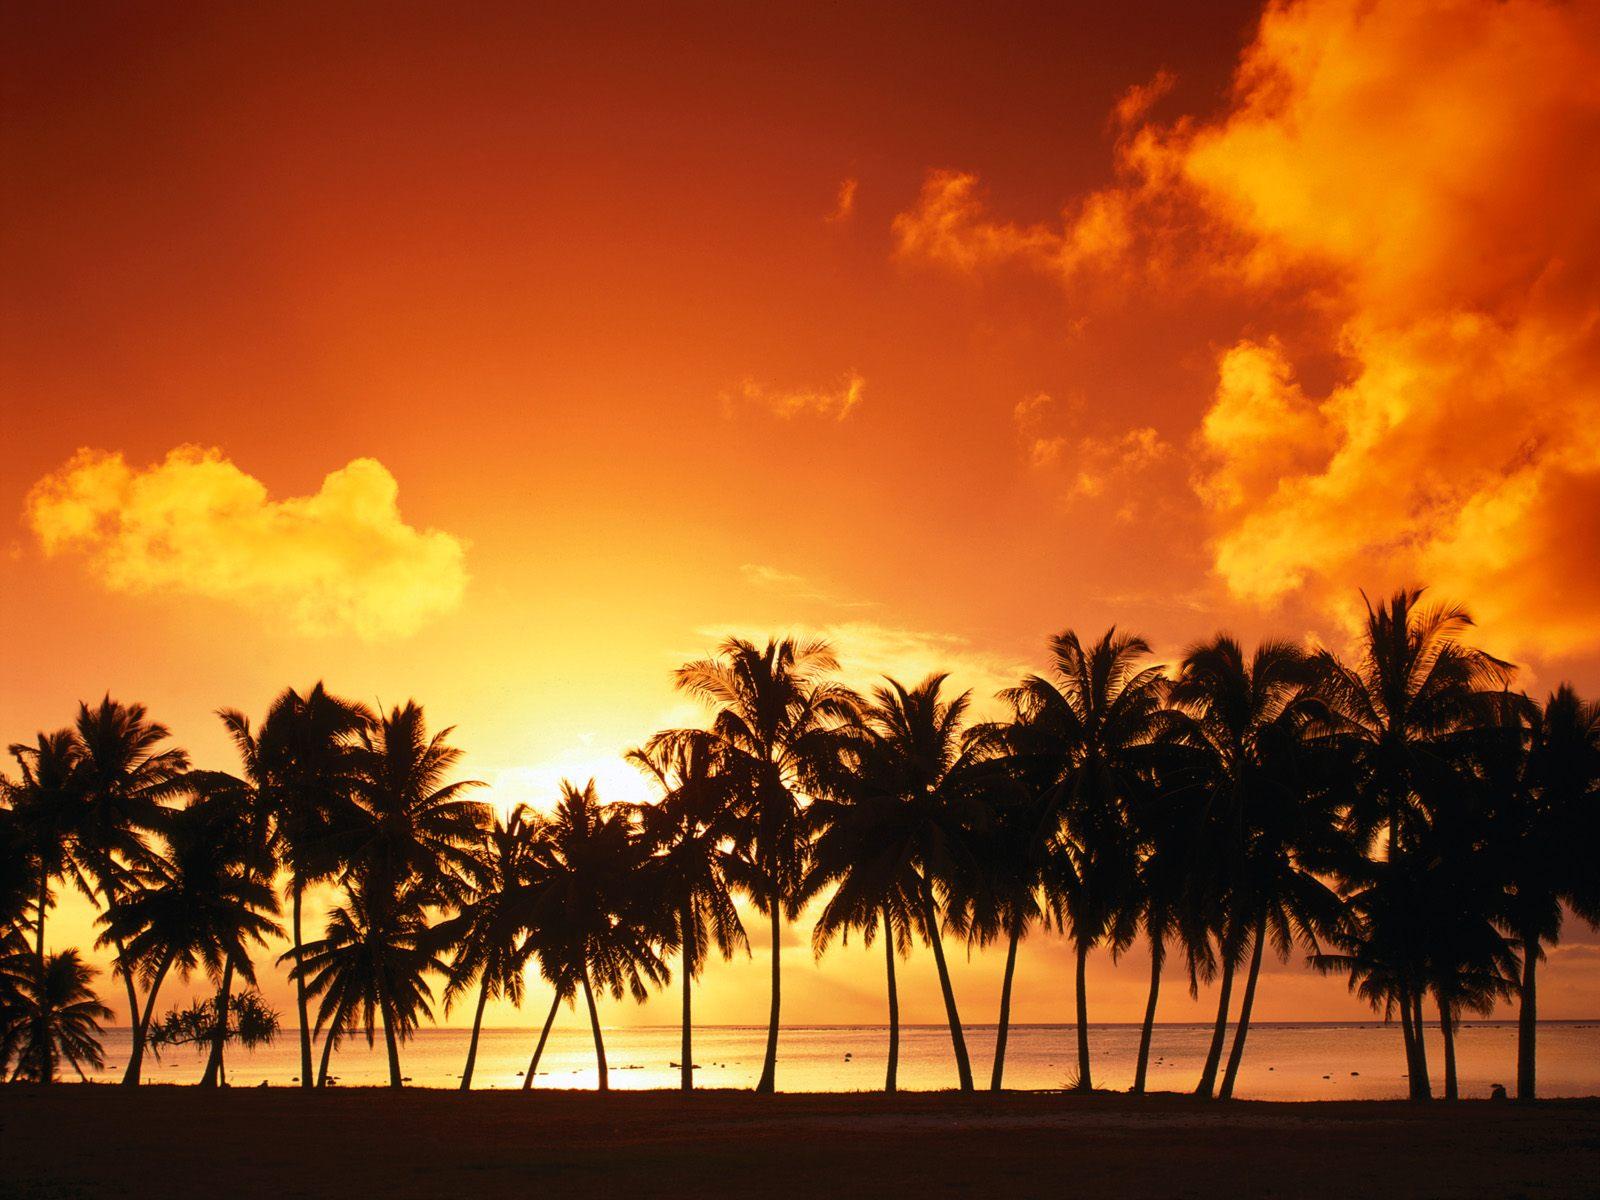 Aitutaki Island at Sunset Cook Islands Wallpapers HD Wallpapers 1600x1200